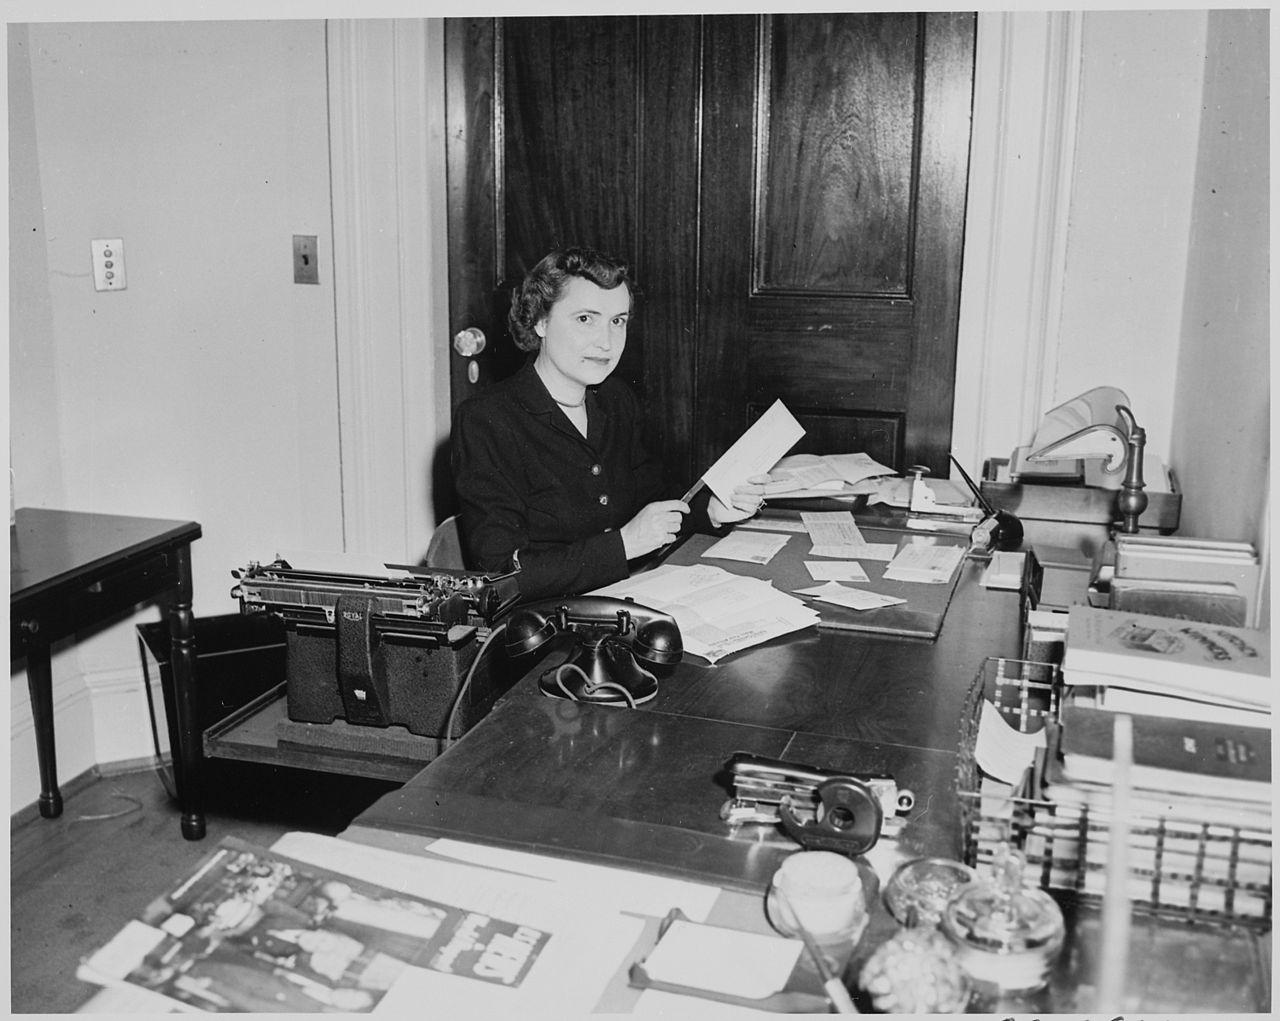 File:Reathel Odum, secretary to Bess Truman, working at her desk ...